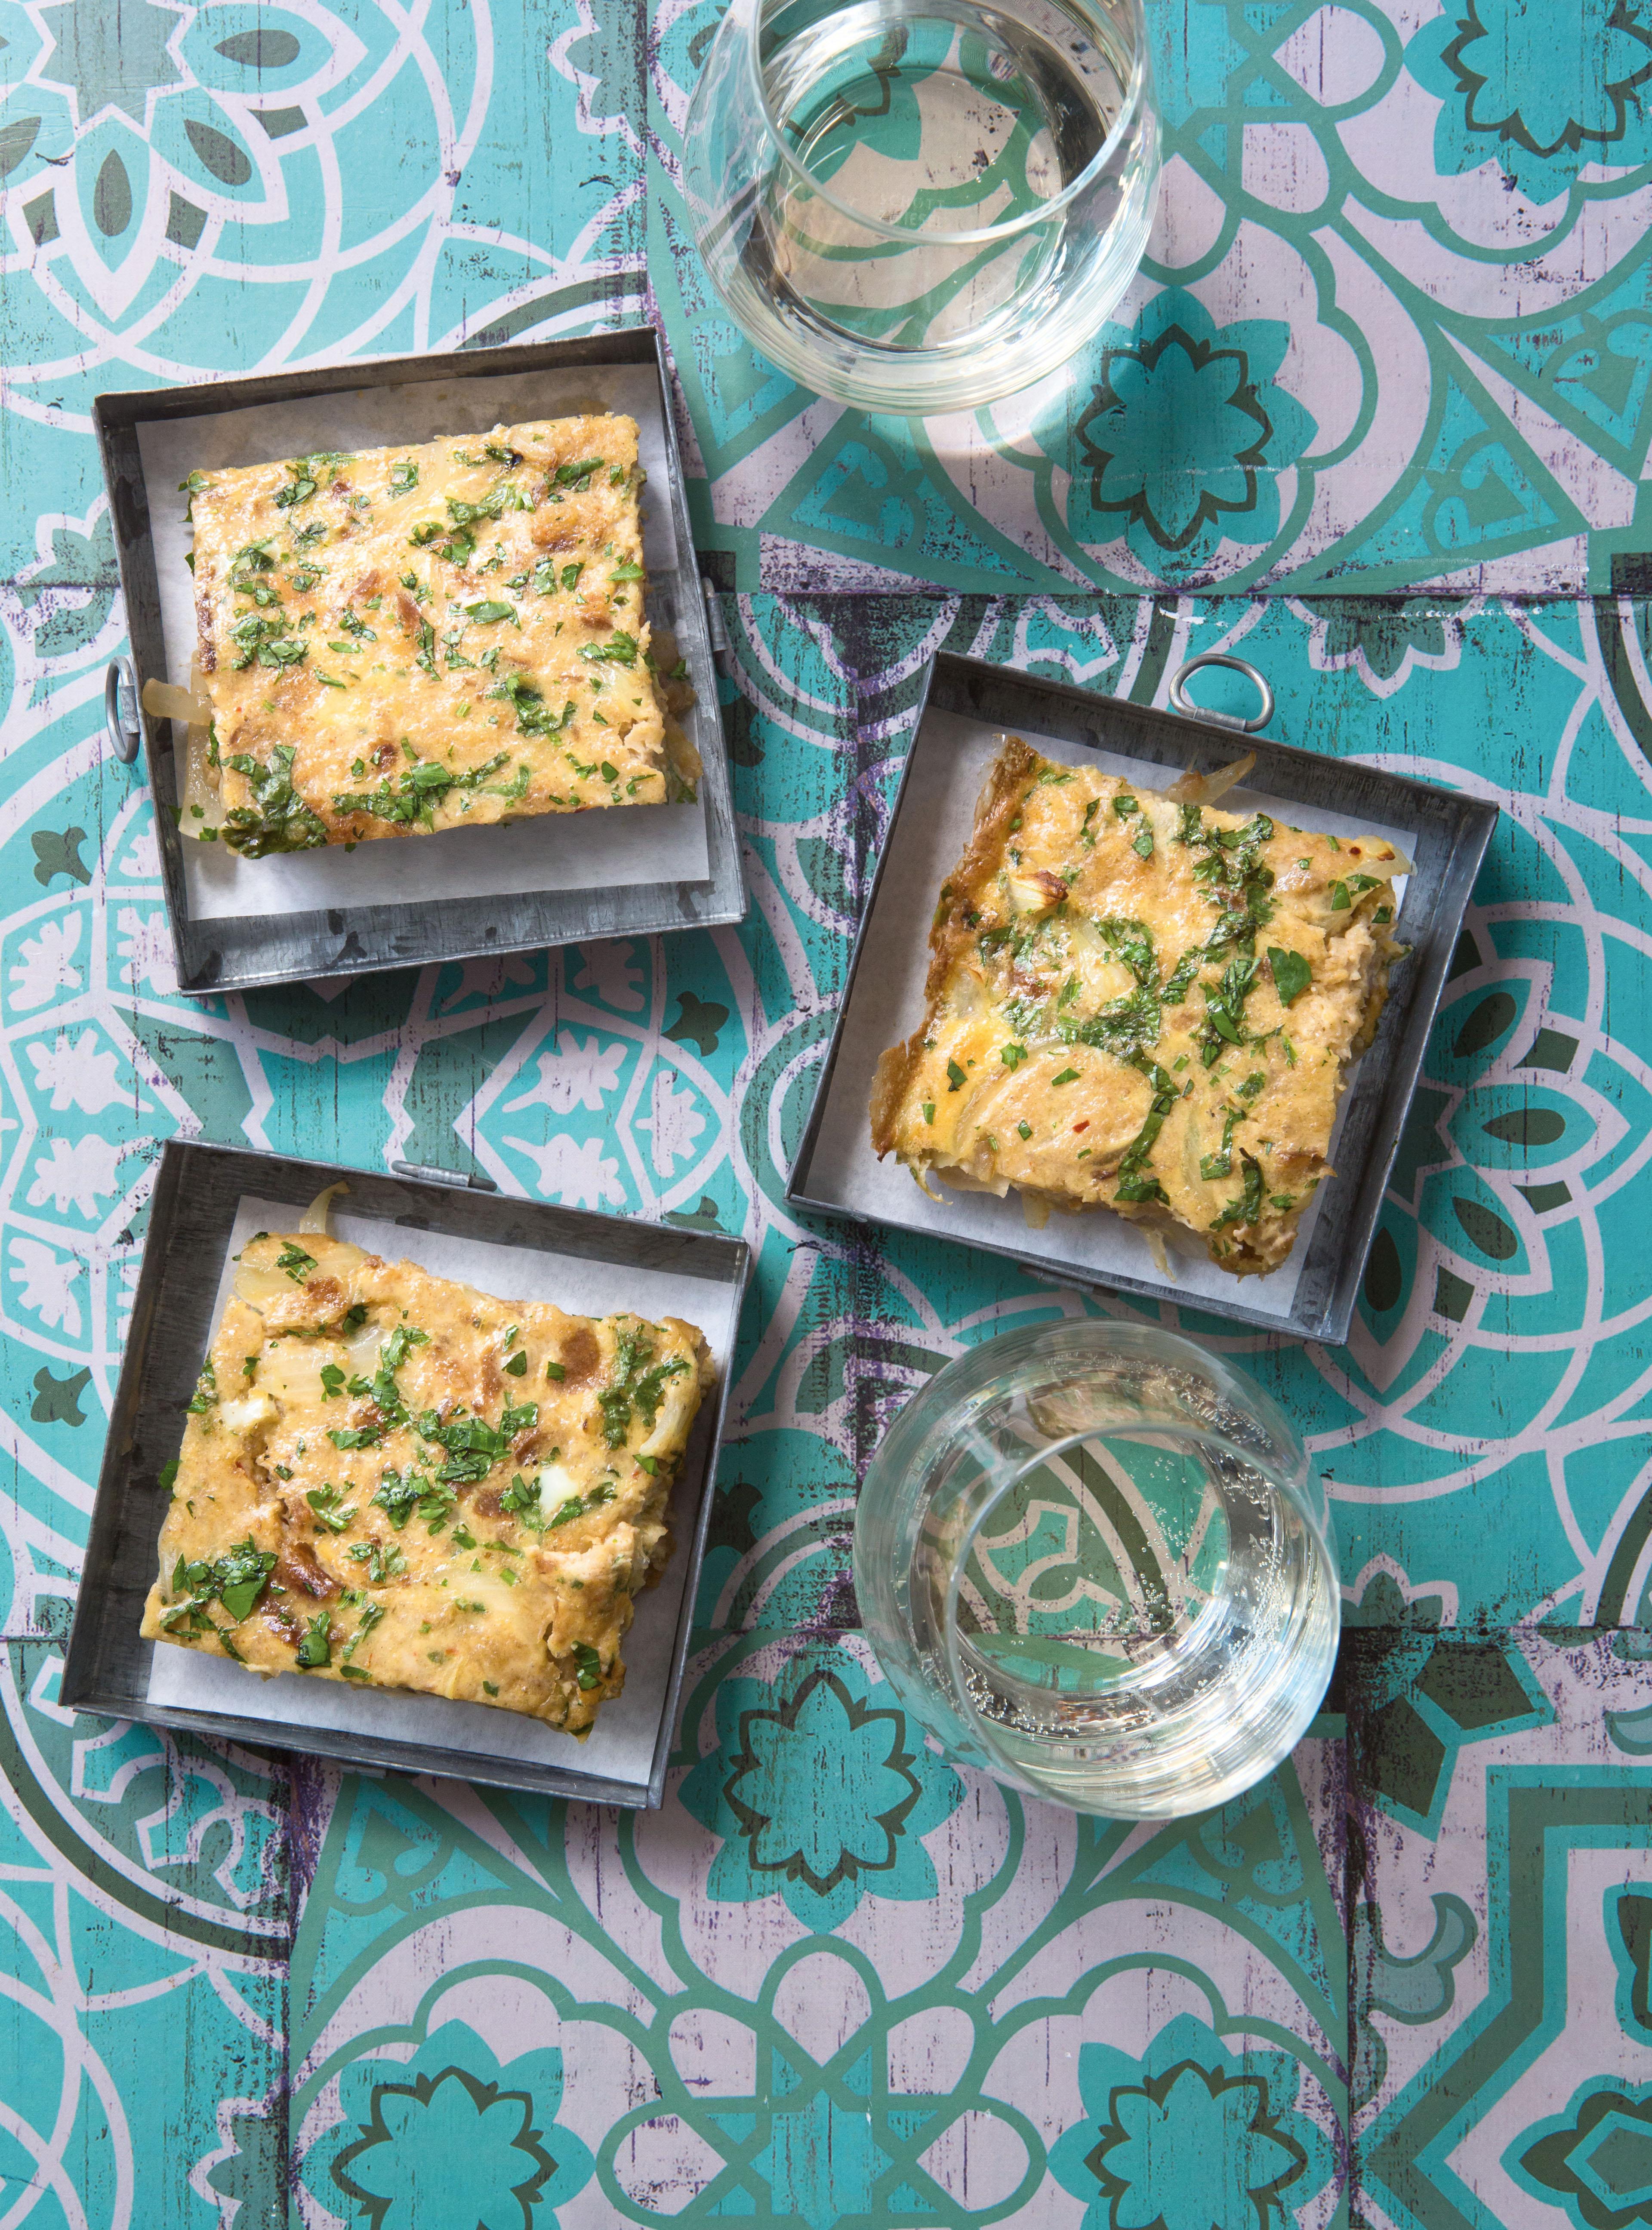 Blaue Stunde Portugal Rezept für Rigas |GourmetGuerilla.de